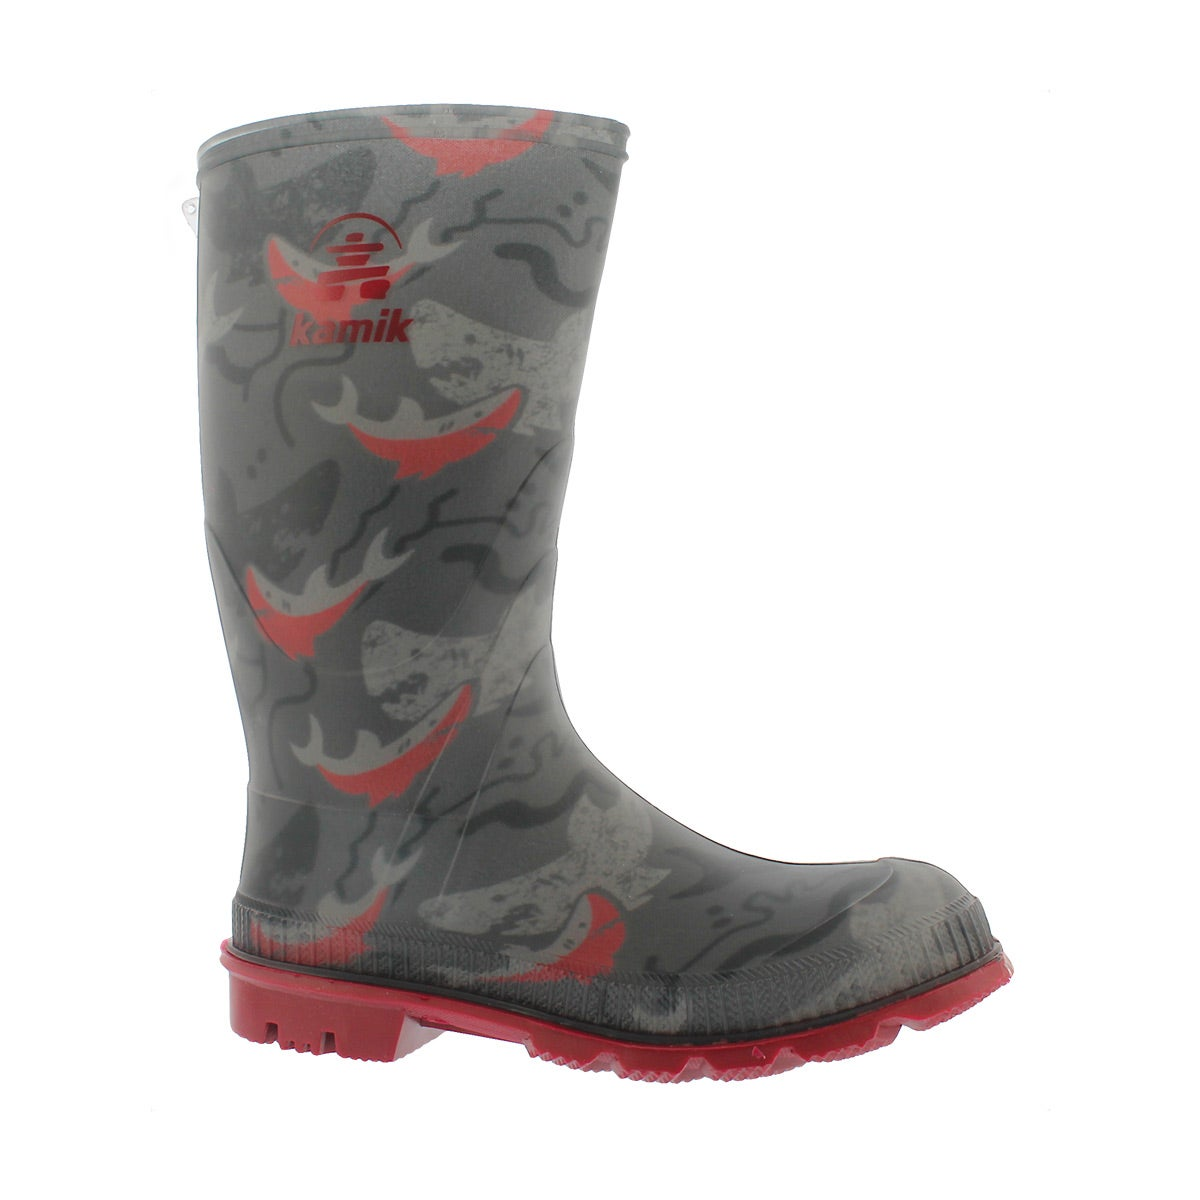 Boys' STOMP2 charcoal/red print wtpf rain boots